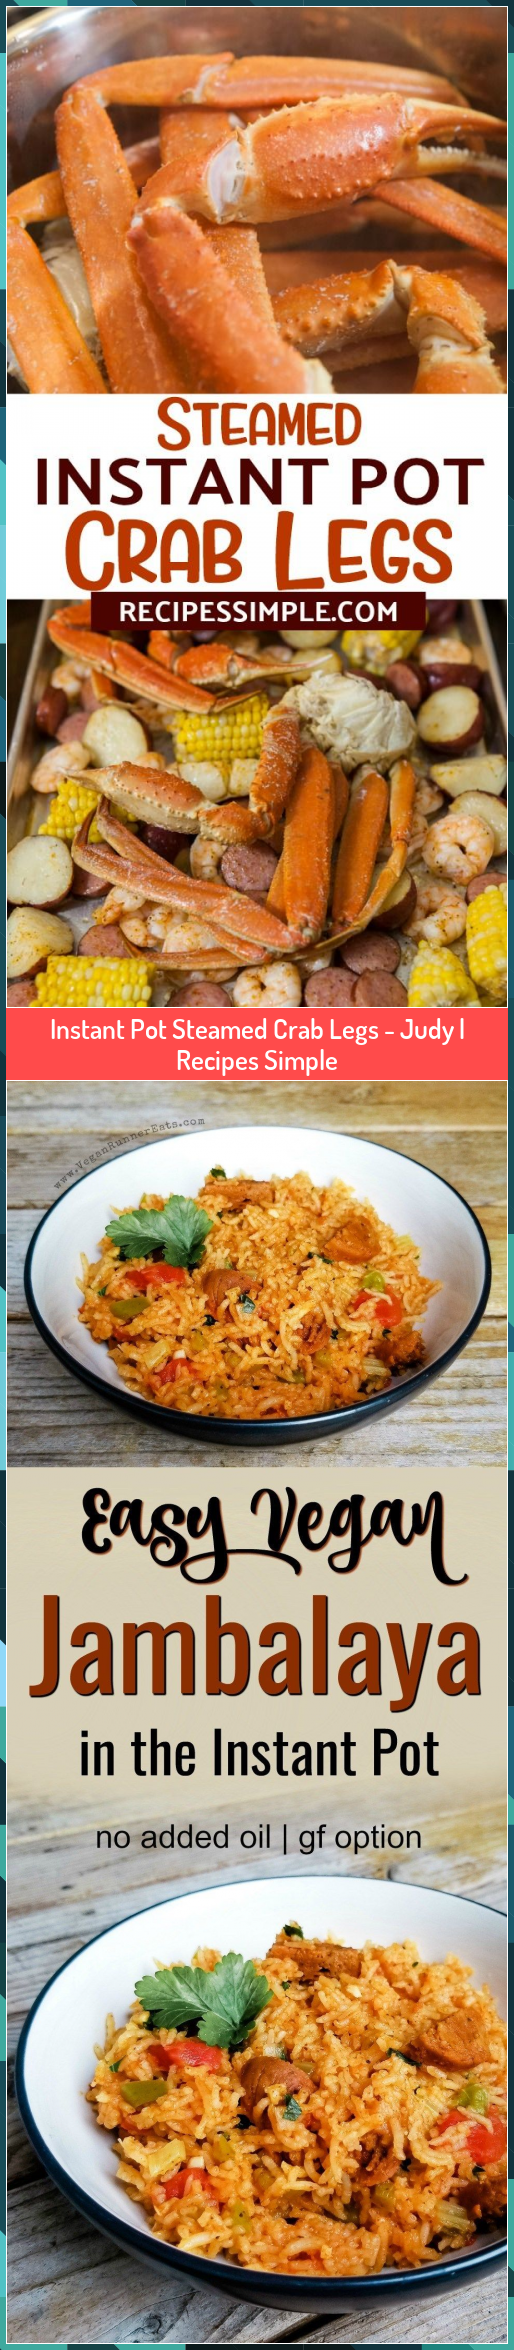 Instant Pot Steamed Crab Legs - Judy | Recipes Simple #Crab #Instant #Judy #Legs #Pot #Recipes #Simple #Steamed